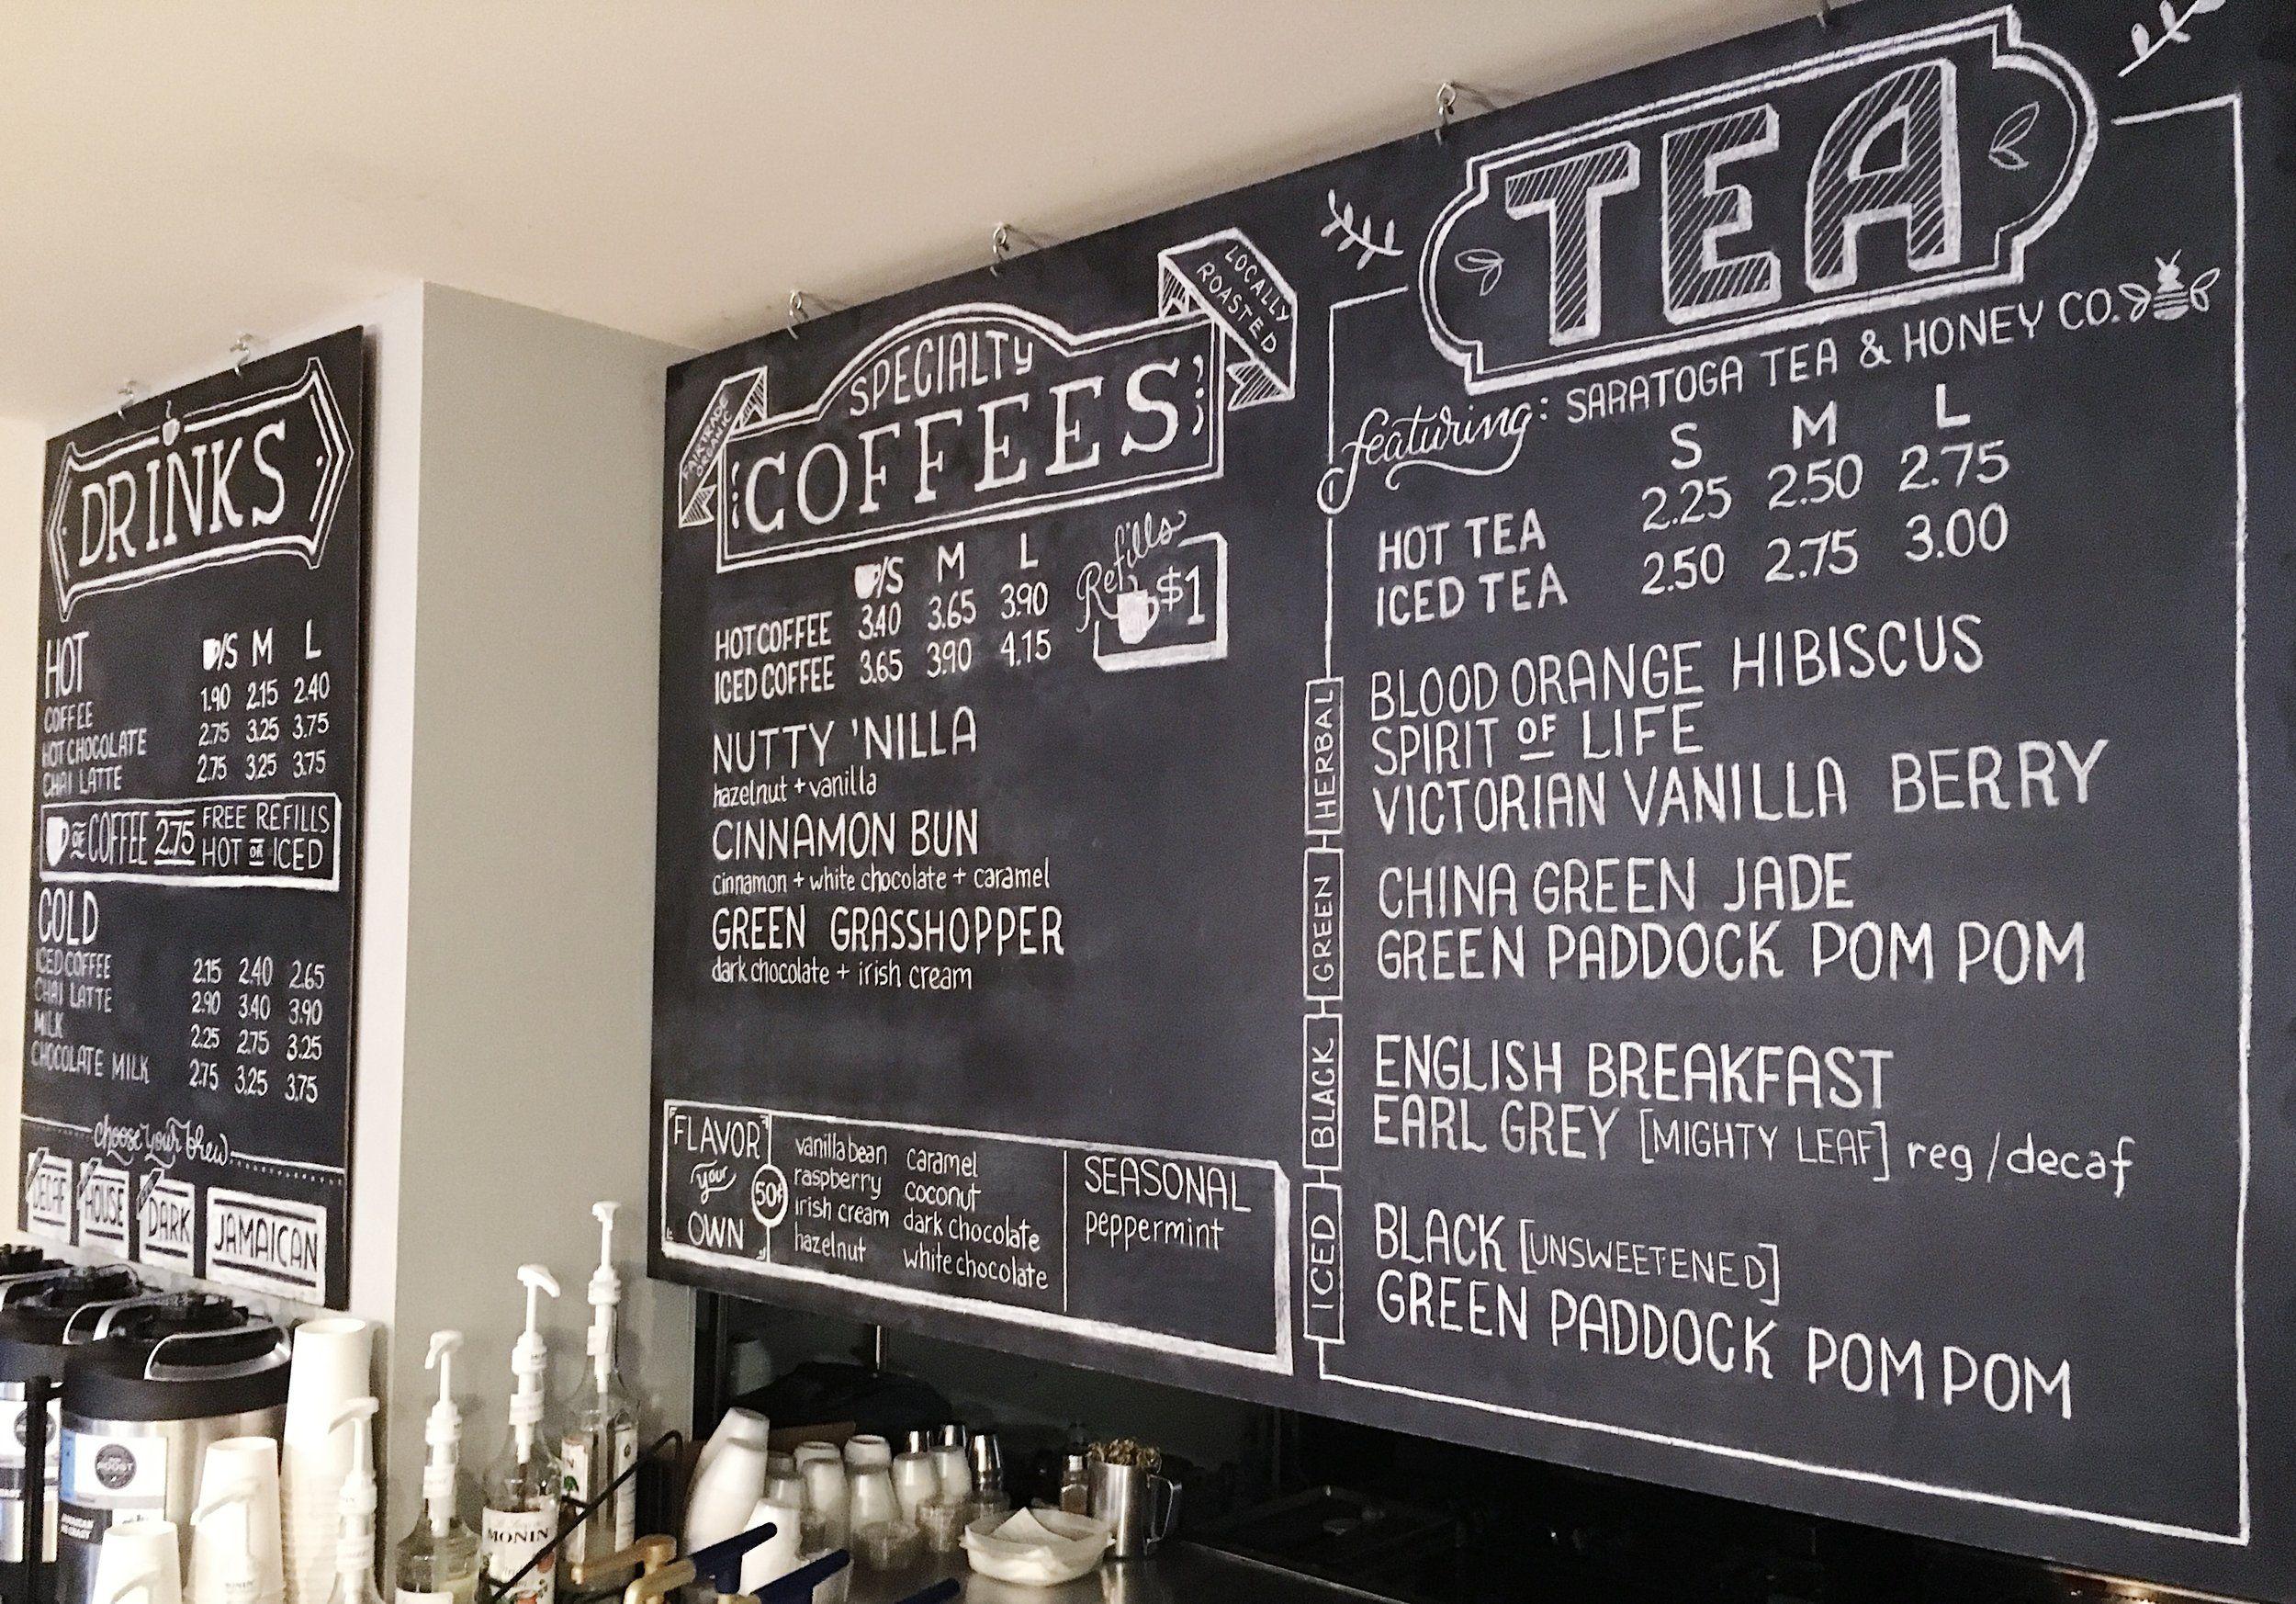 Pin By Alyssa Cavallari On Crafting And Calligraphy Chalkboard Restaurant Coffee Shop Menu Coffee Chalkboard